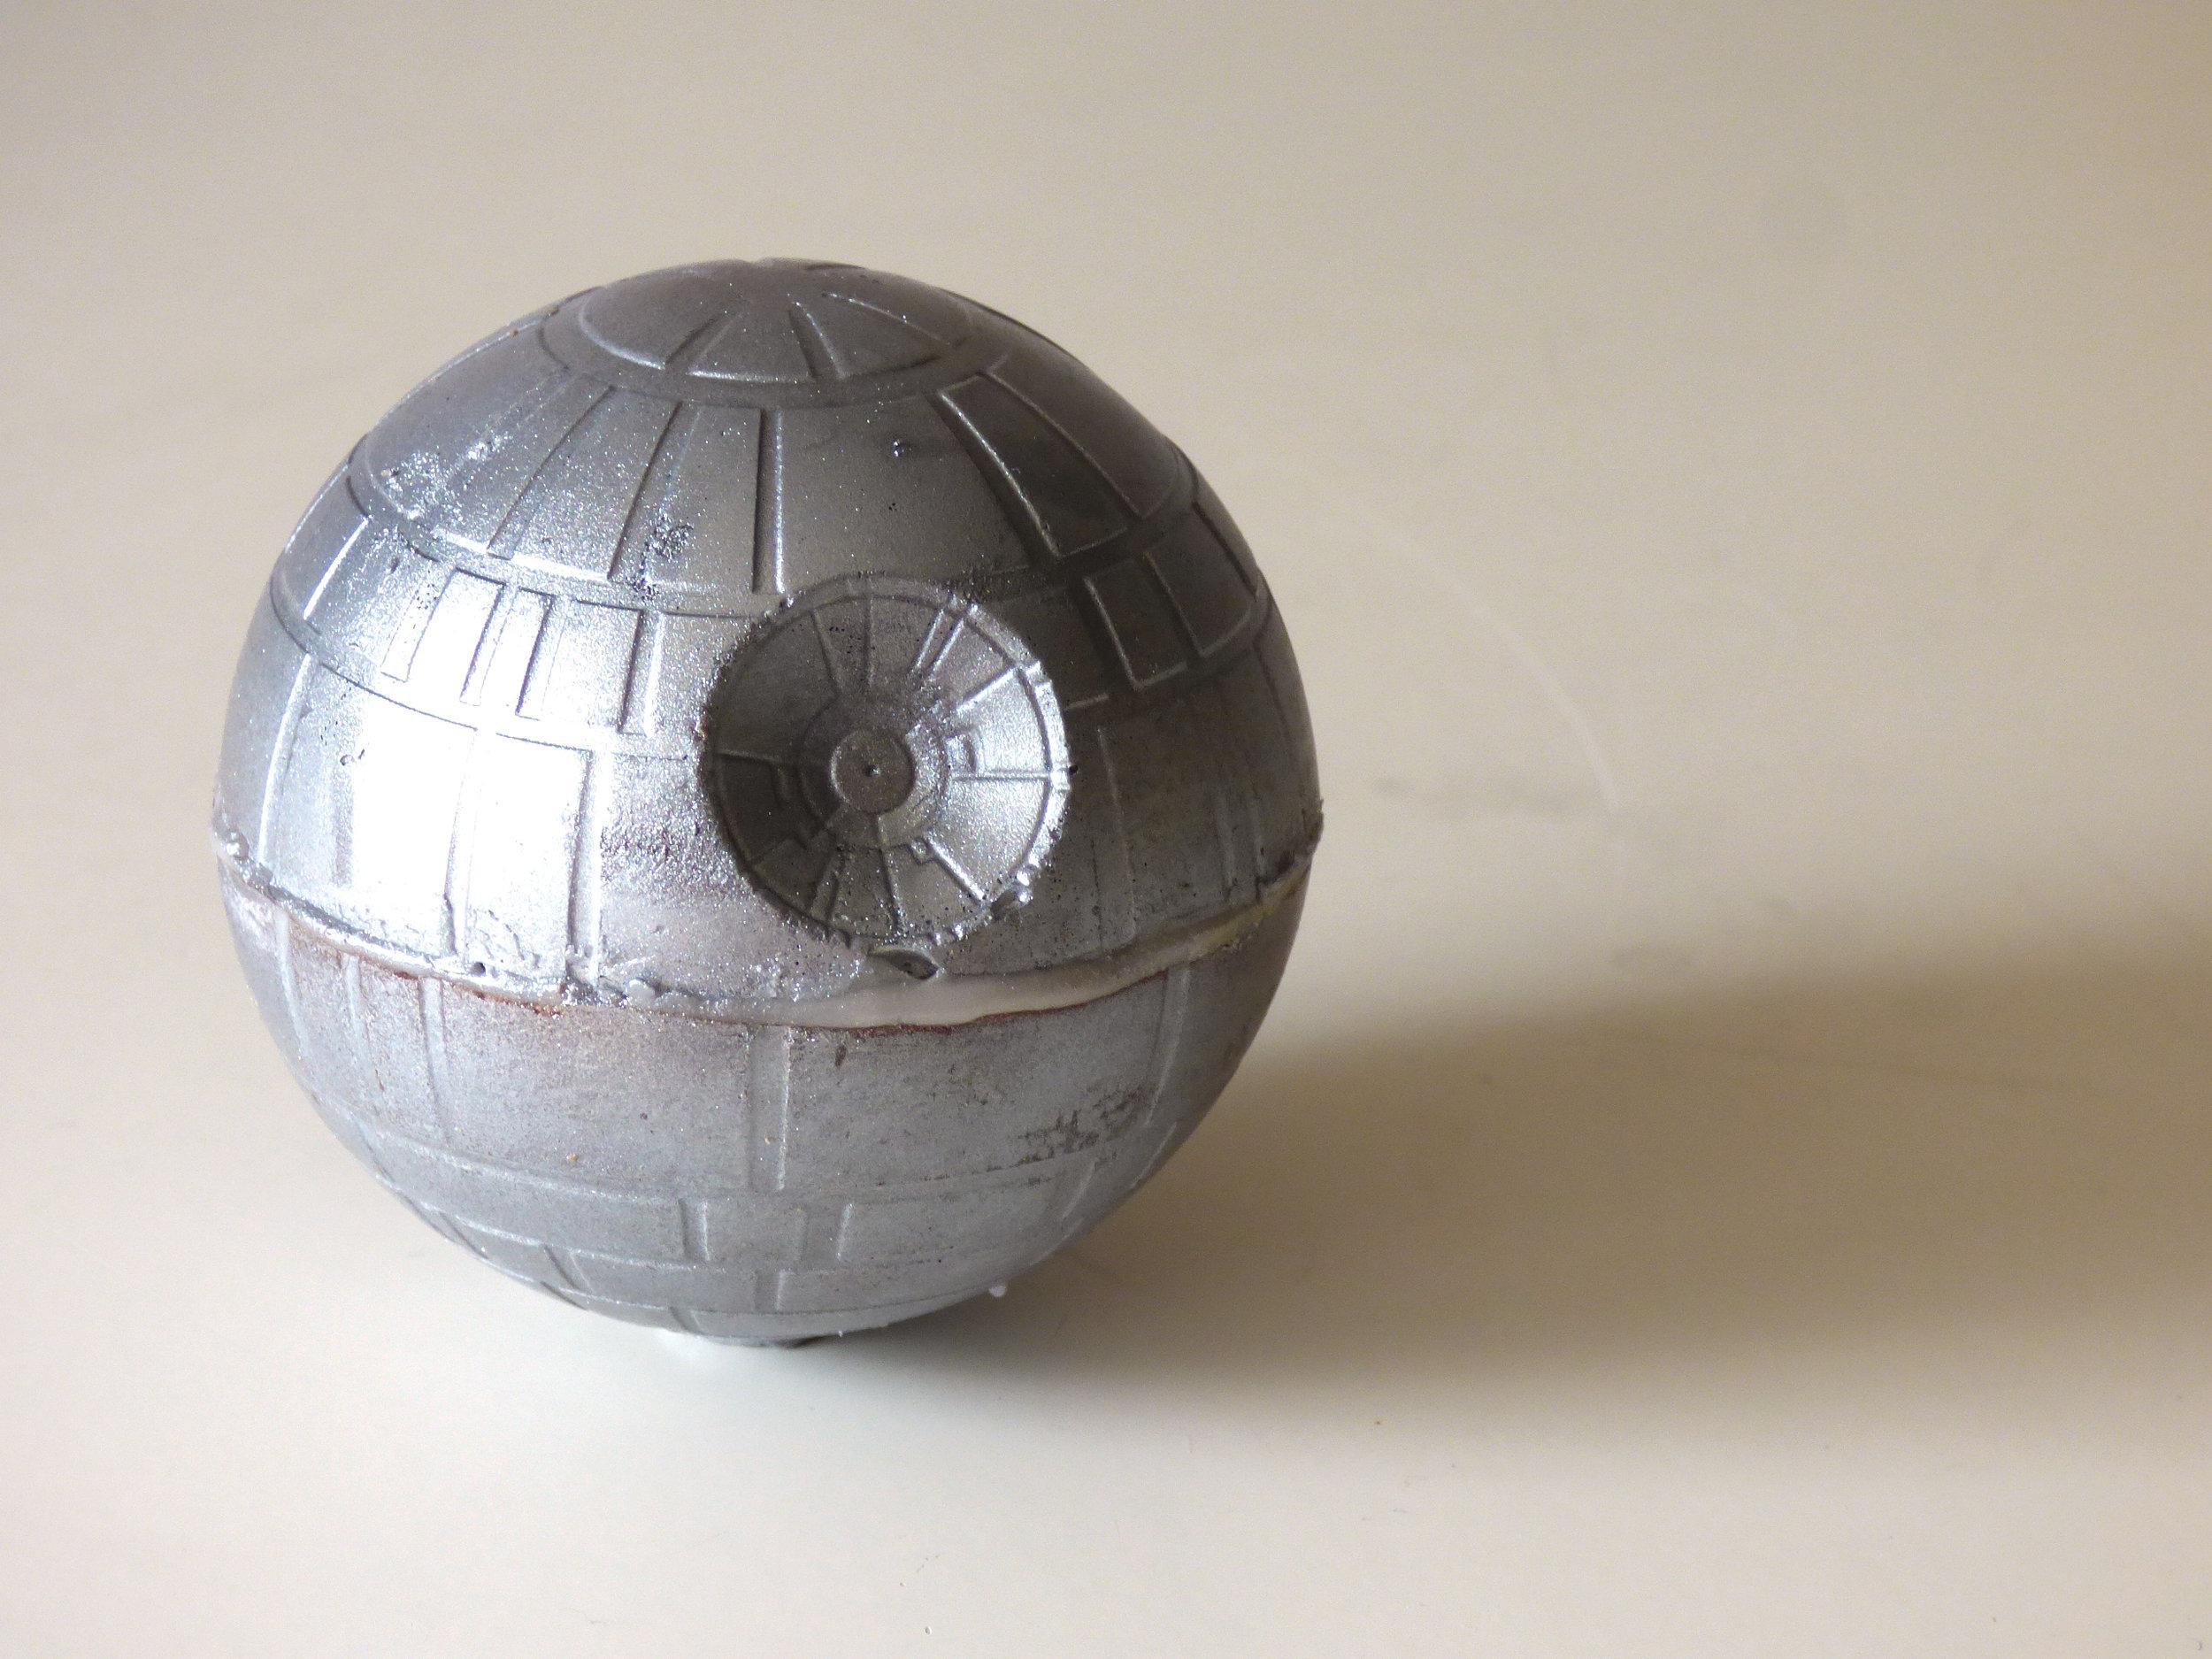 Death Star Creme Egg!